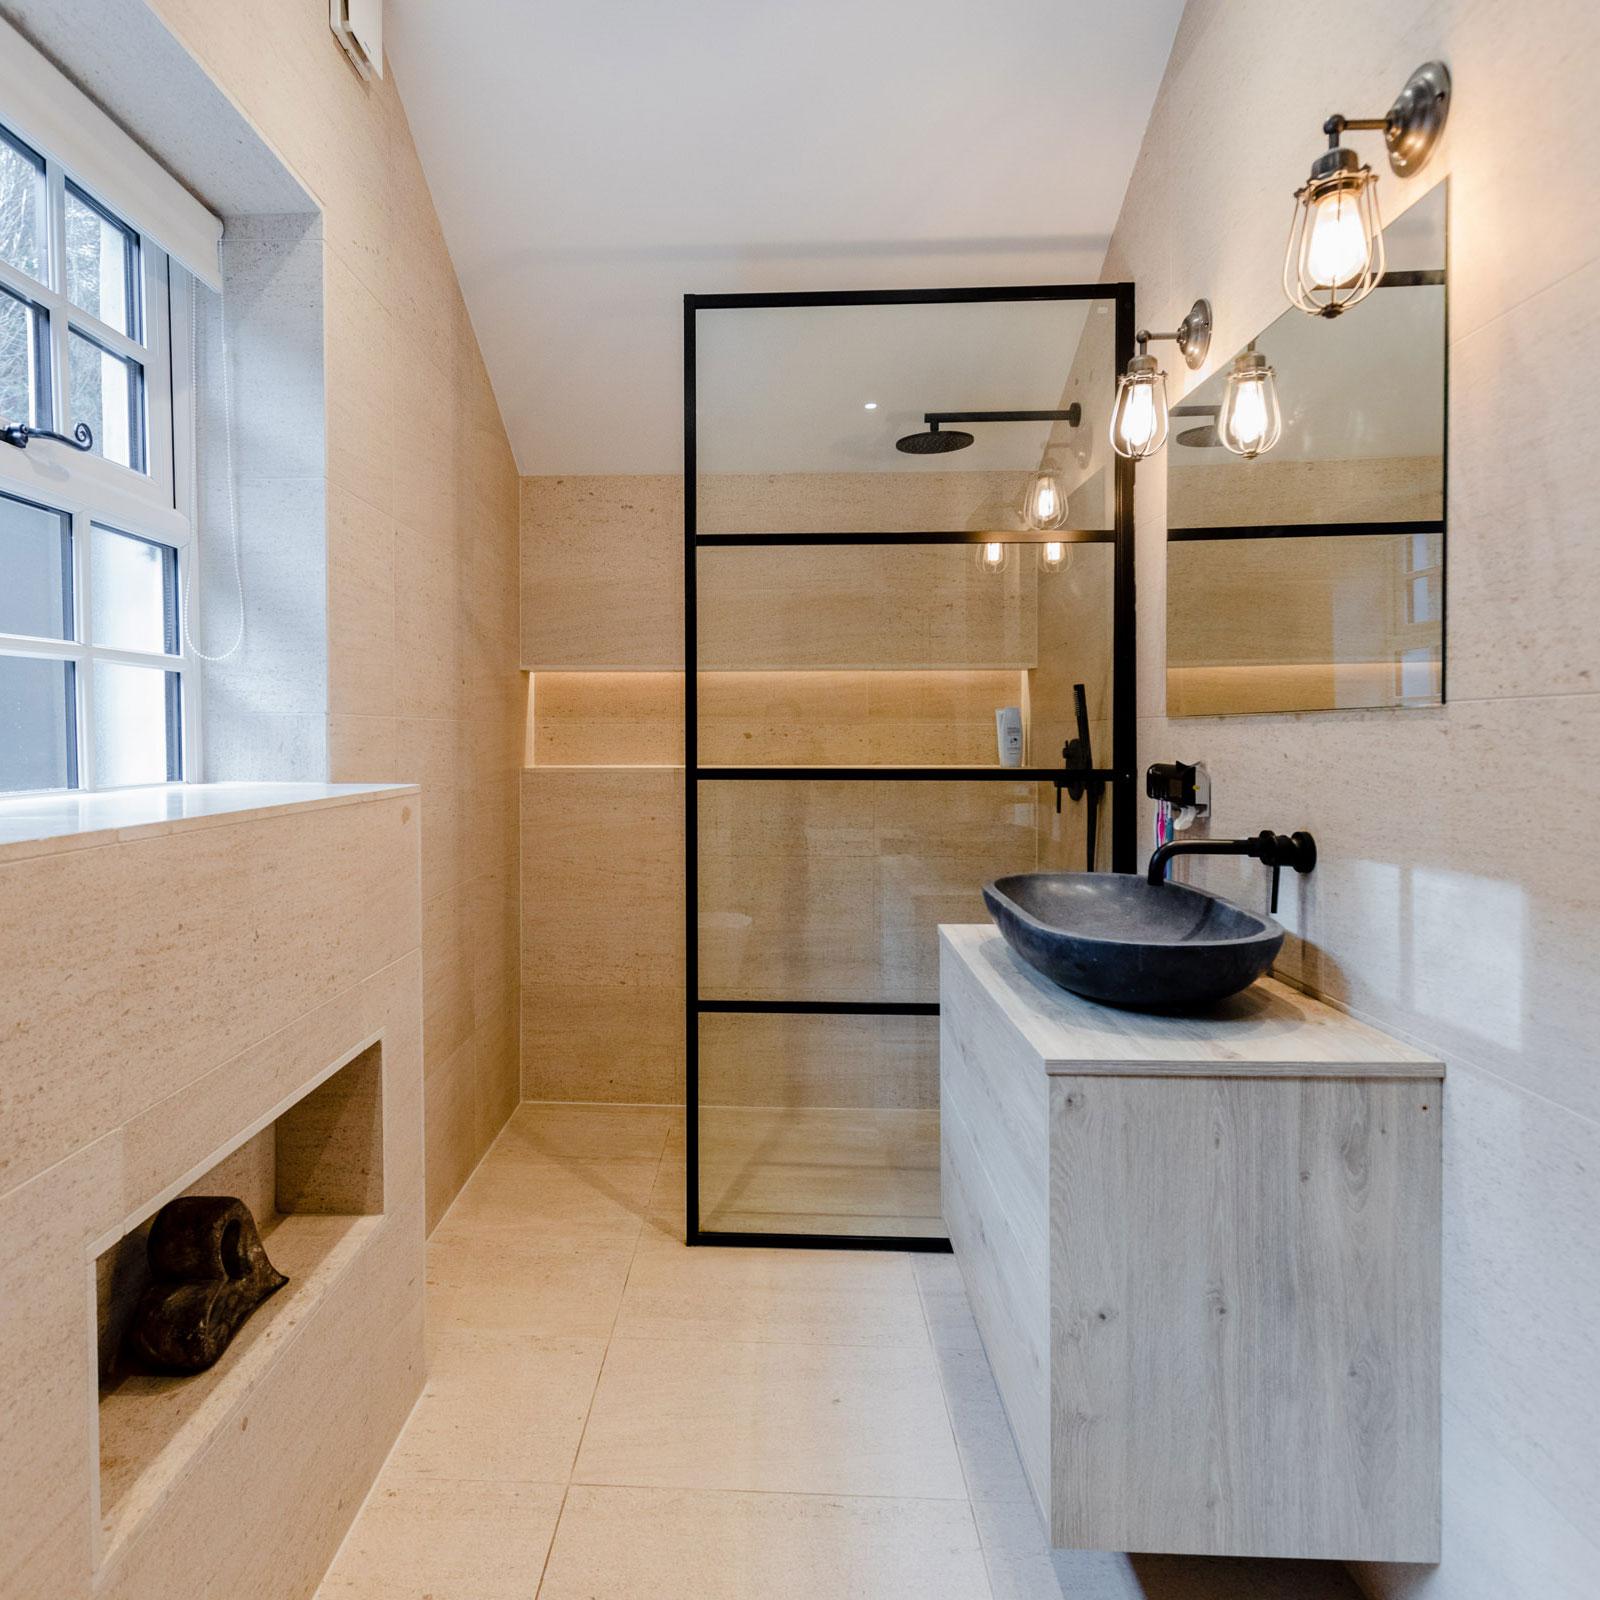 Kitchen Bathroom Exhibition Uk: Bathrooms